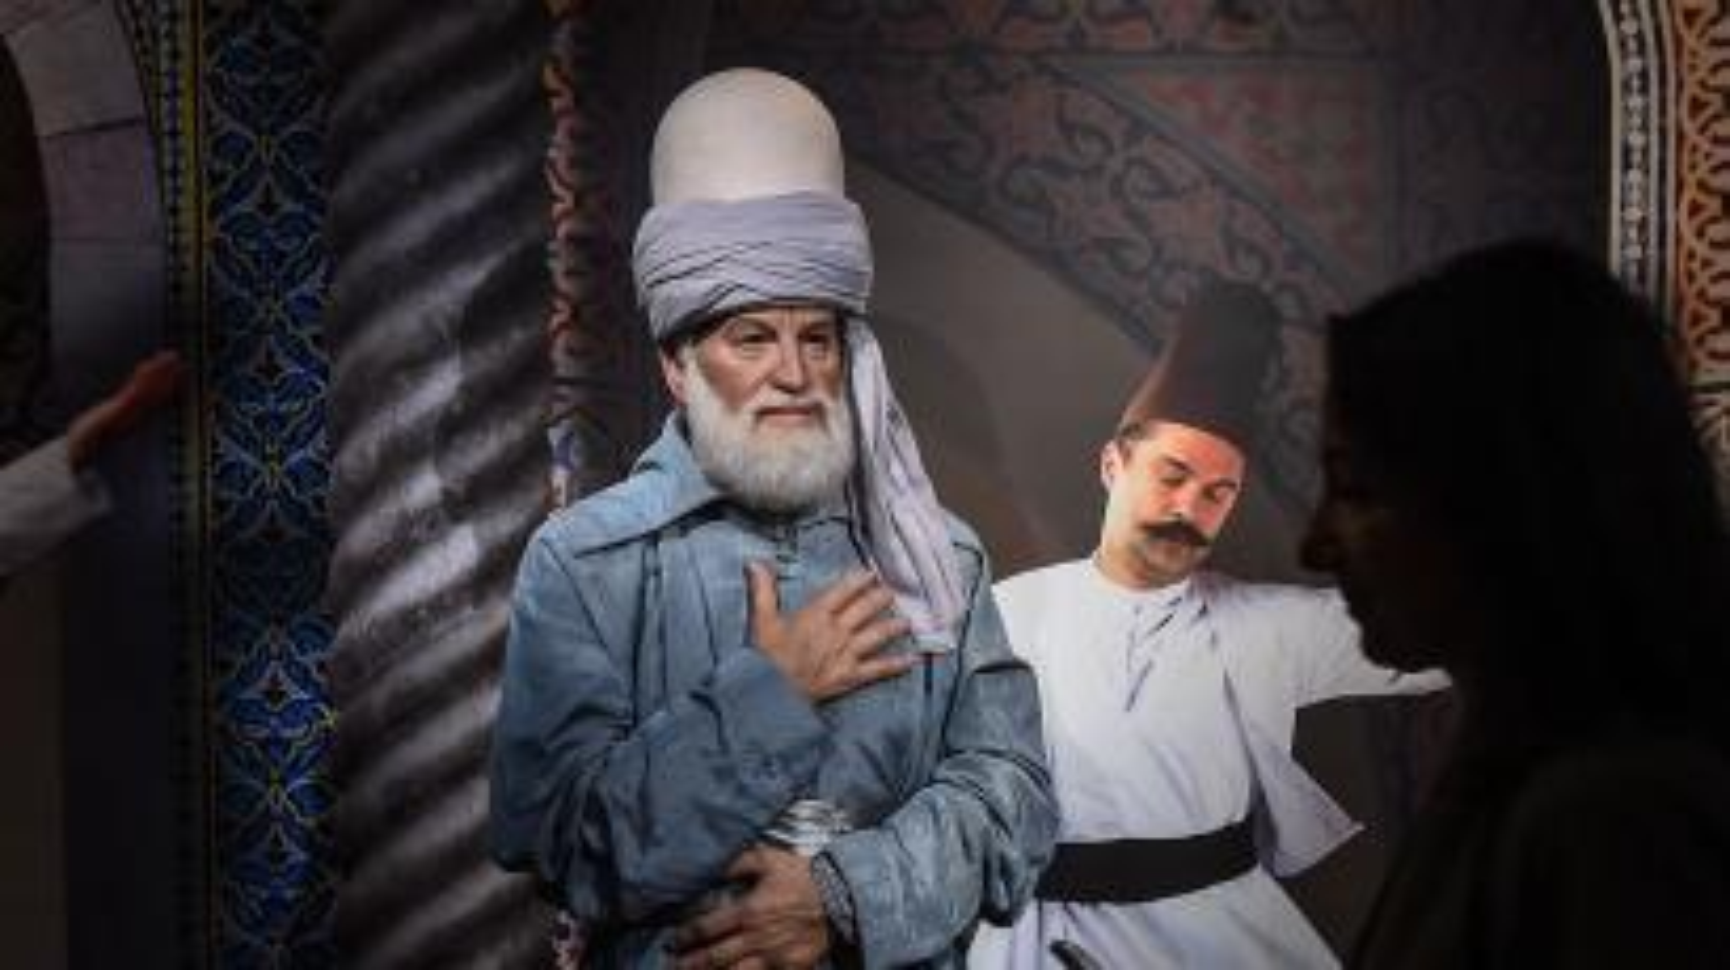 A wax figure of the poet Rumi